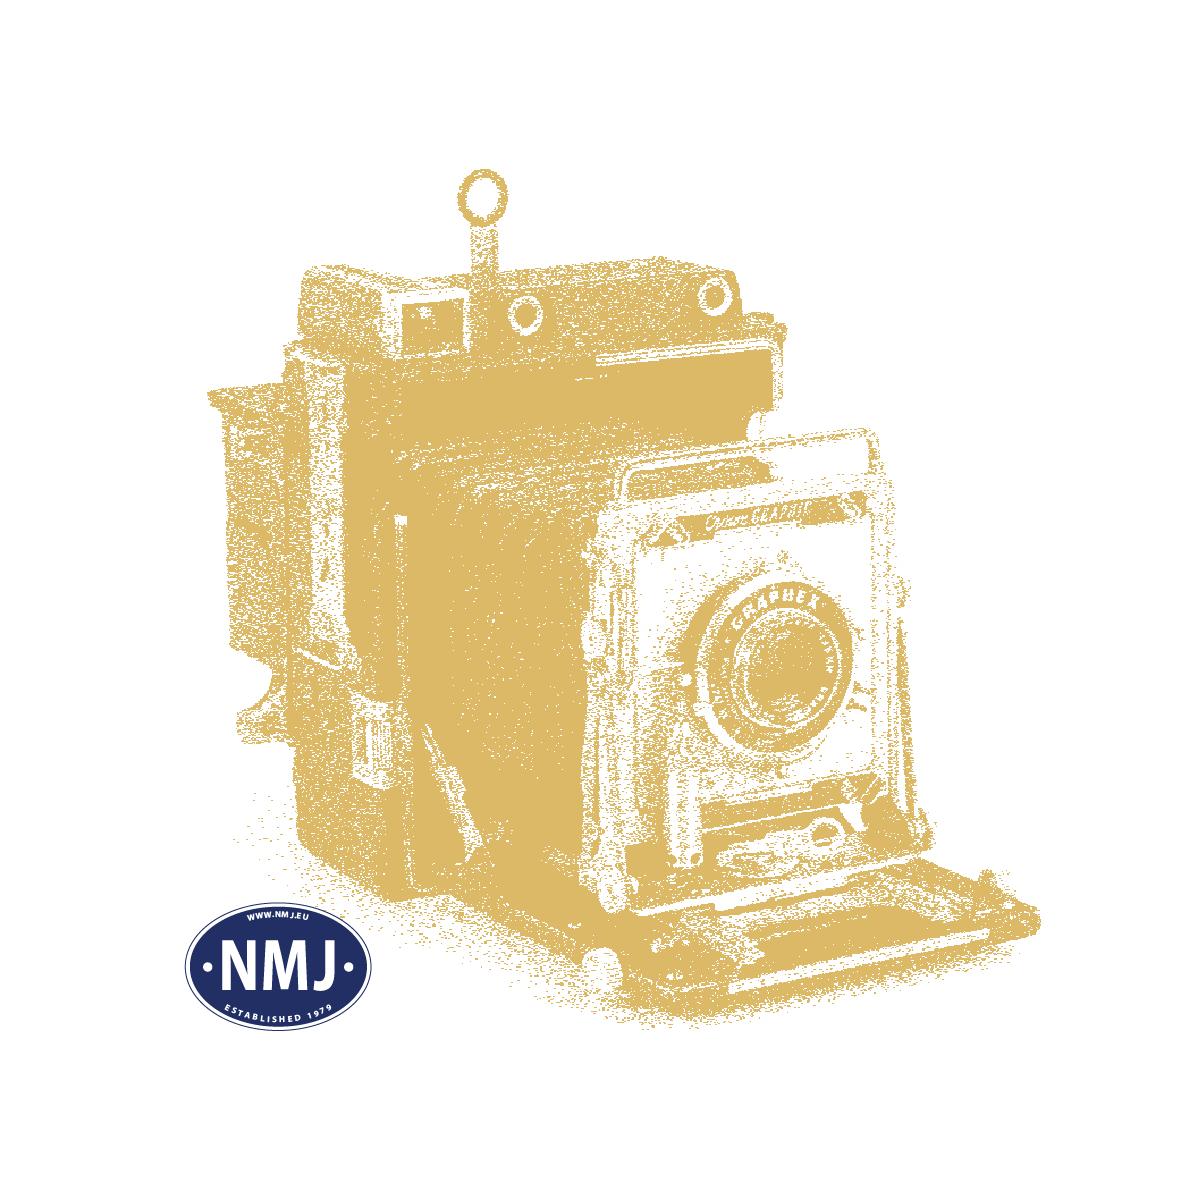 NMJTKAT16 - NMJ Topline & Skyline Katalog 2016